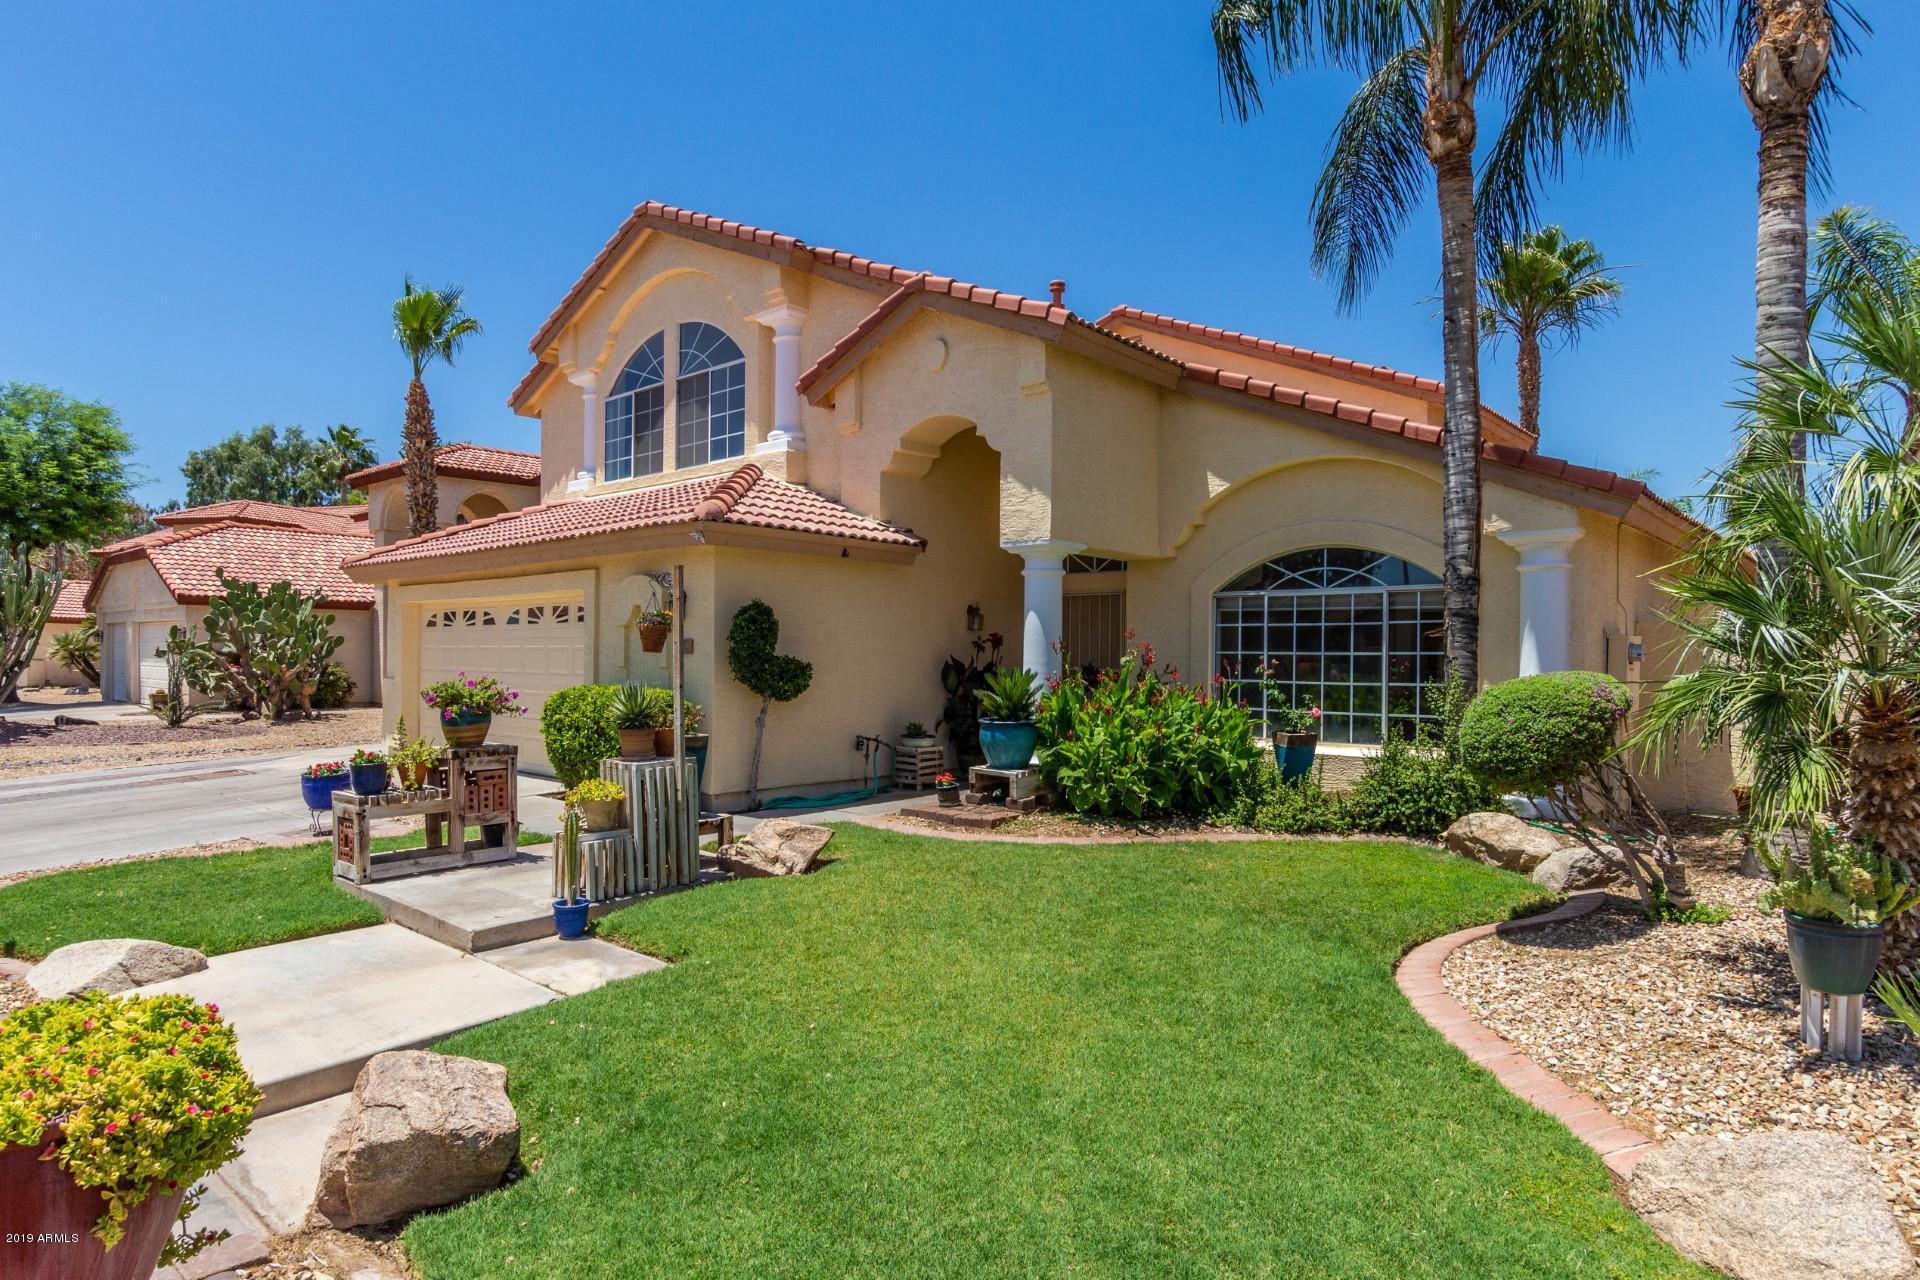 Photo of 11410 W Rosewood Drive, Avondale, AZ 85392